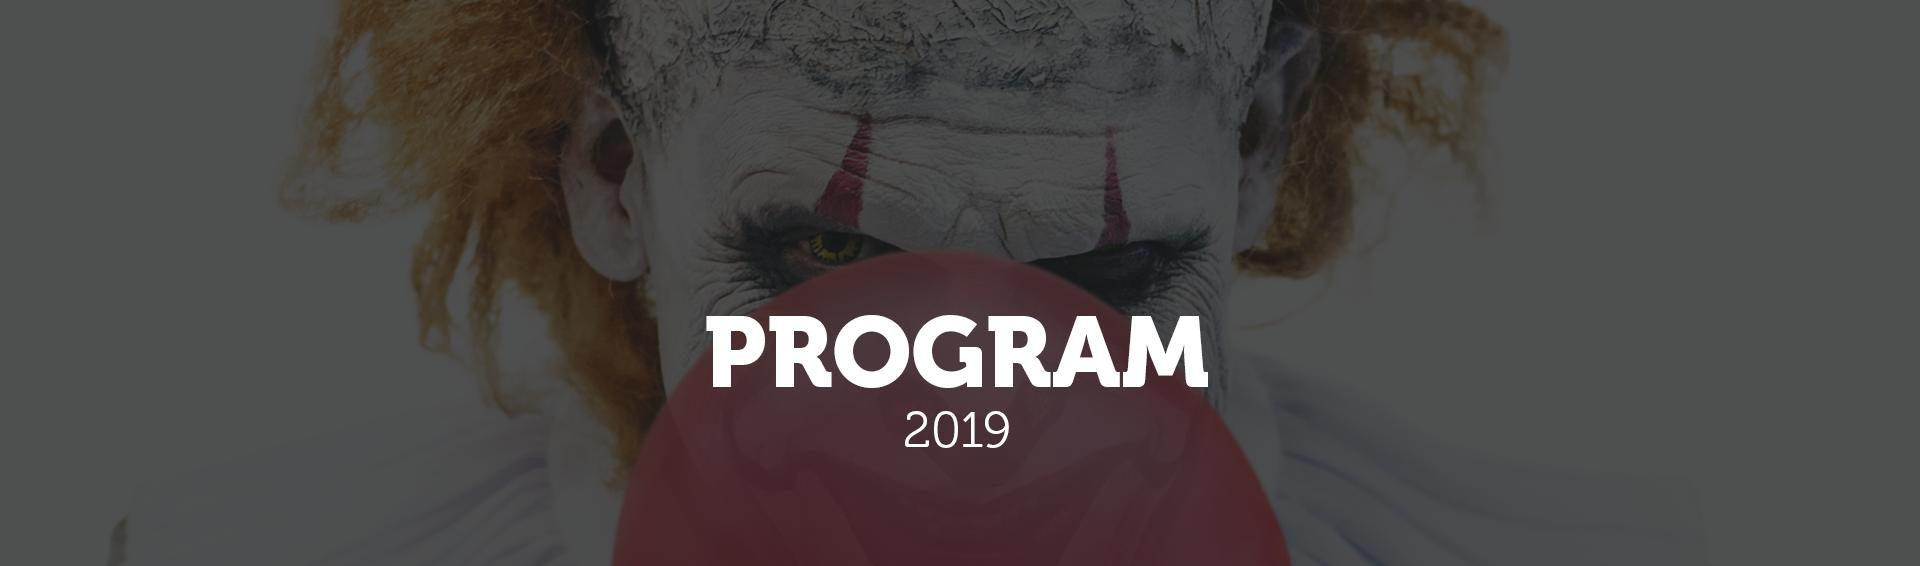 FFCV2019-uvodni-foto-na-web-_-program